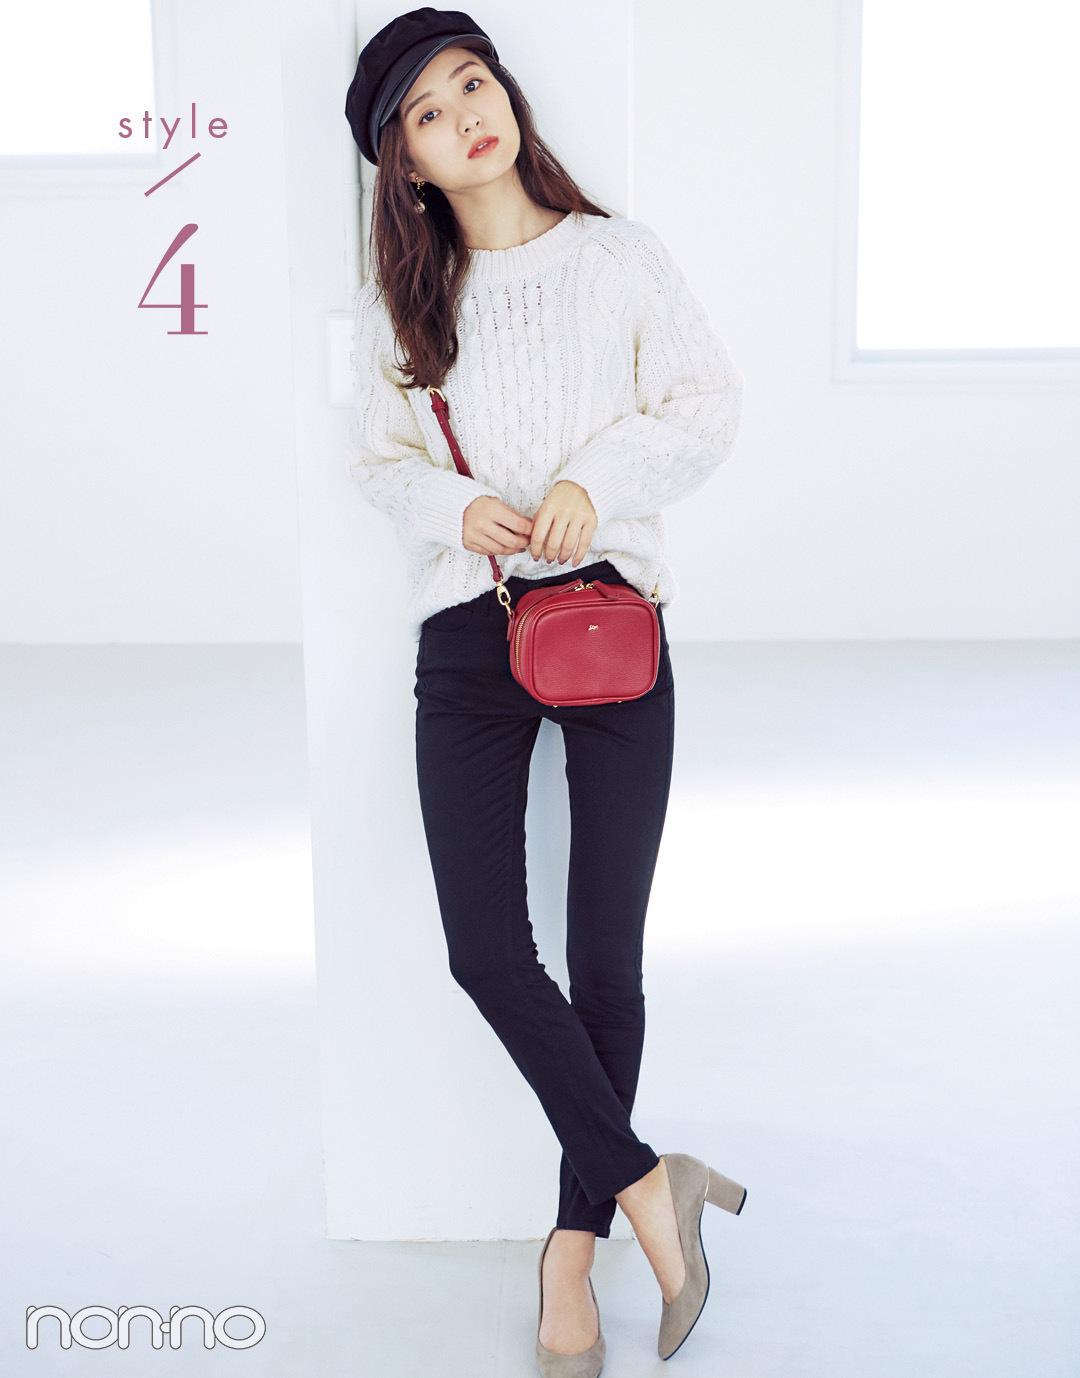 style/4